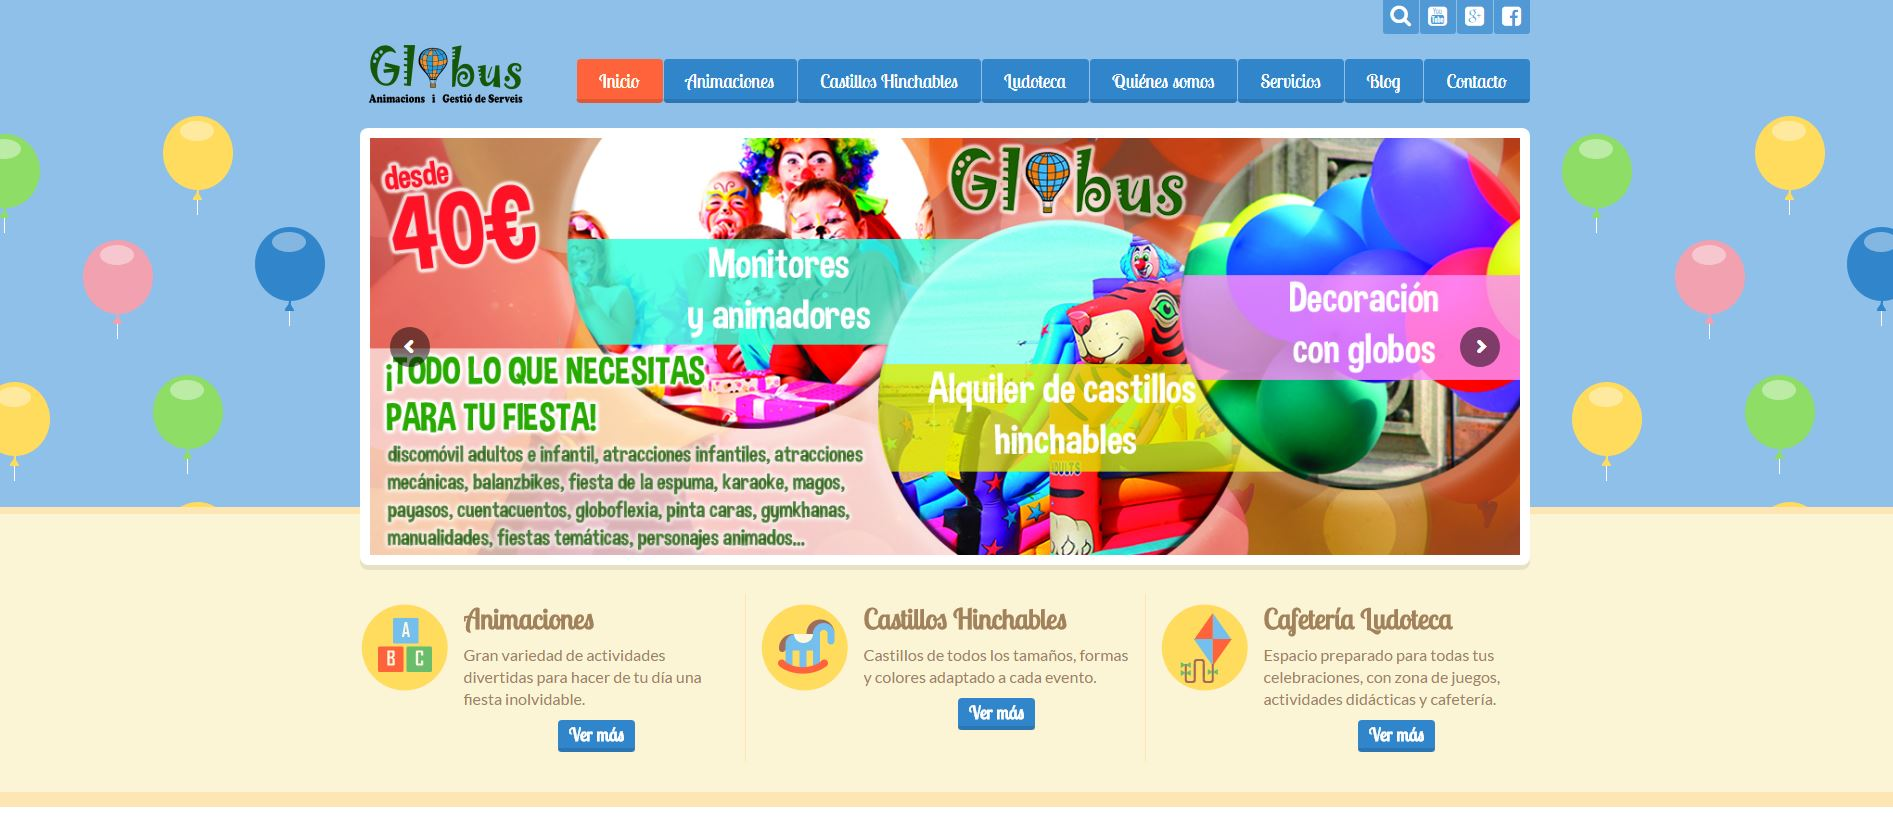 Globus Animacions imagen 3